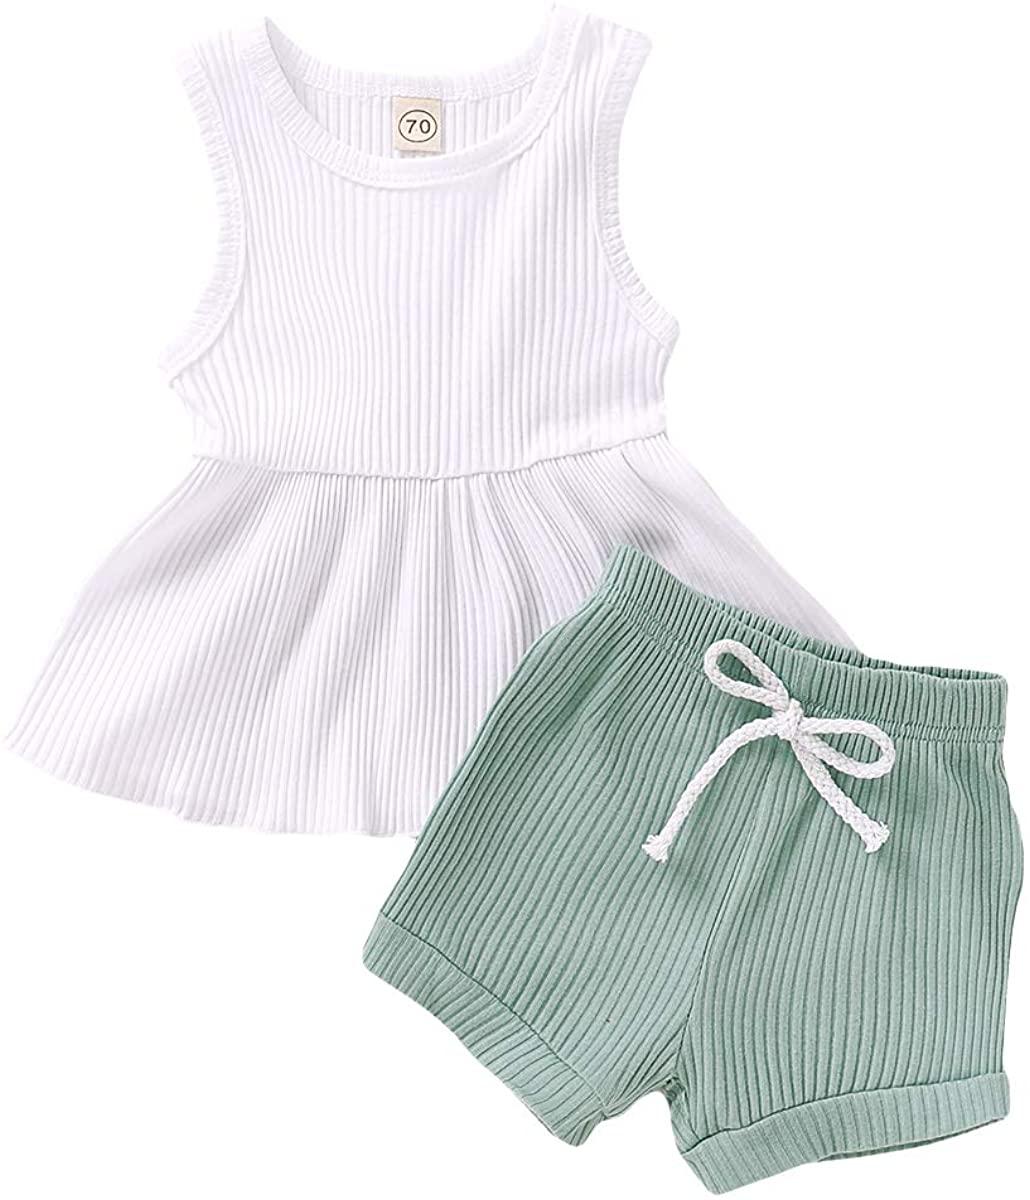 Infant Toddler Baby Girls Summer Outfits Tutu Sleeveless T-Shirt Tops + Elastic Waist Shorts 2Pcs Clothes